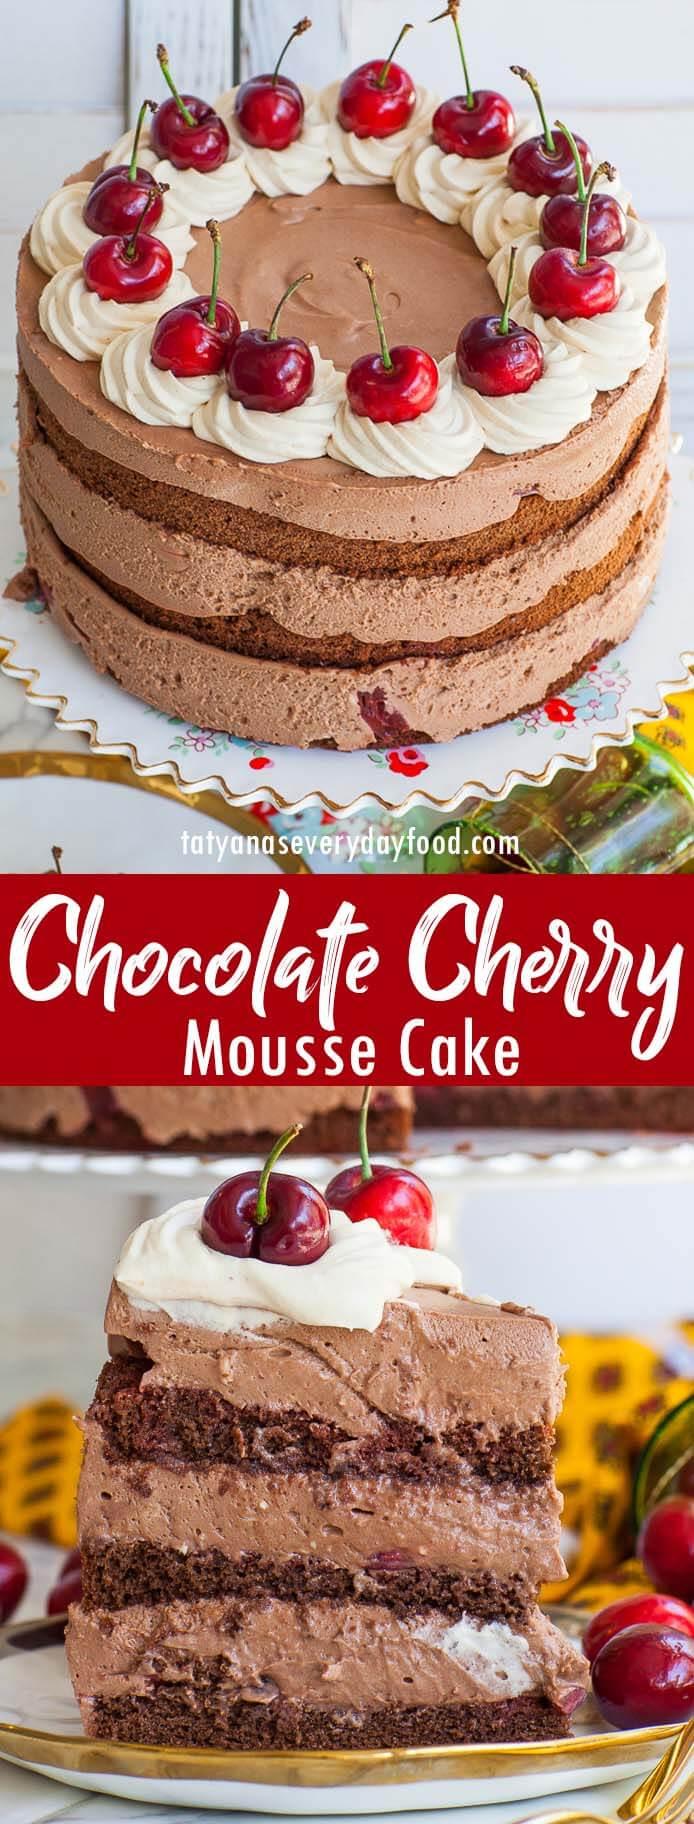 Chocolate Cherry Mousse Cake video recipe